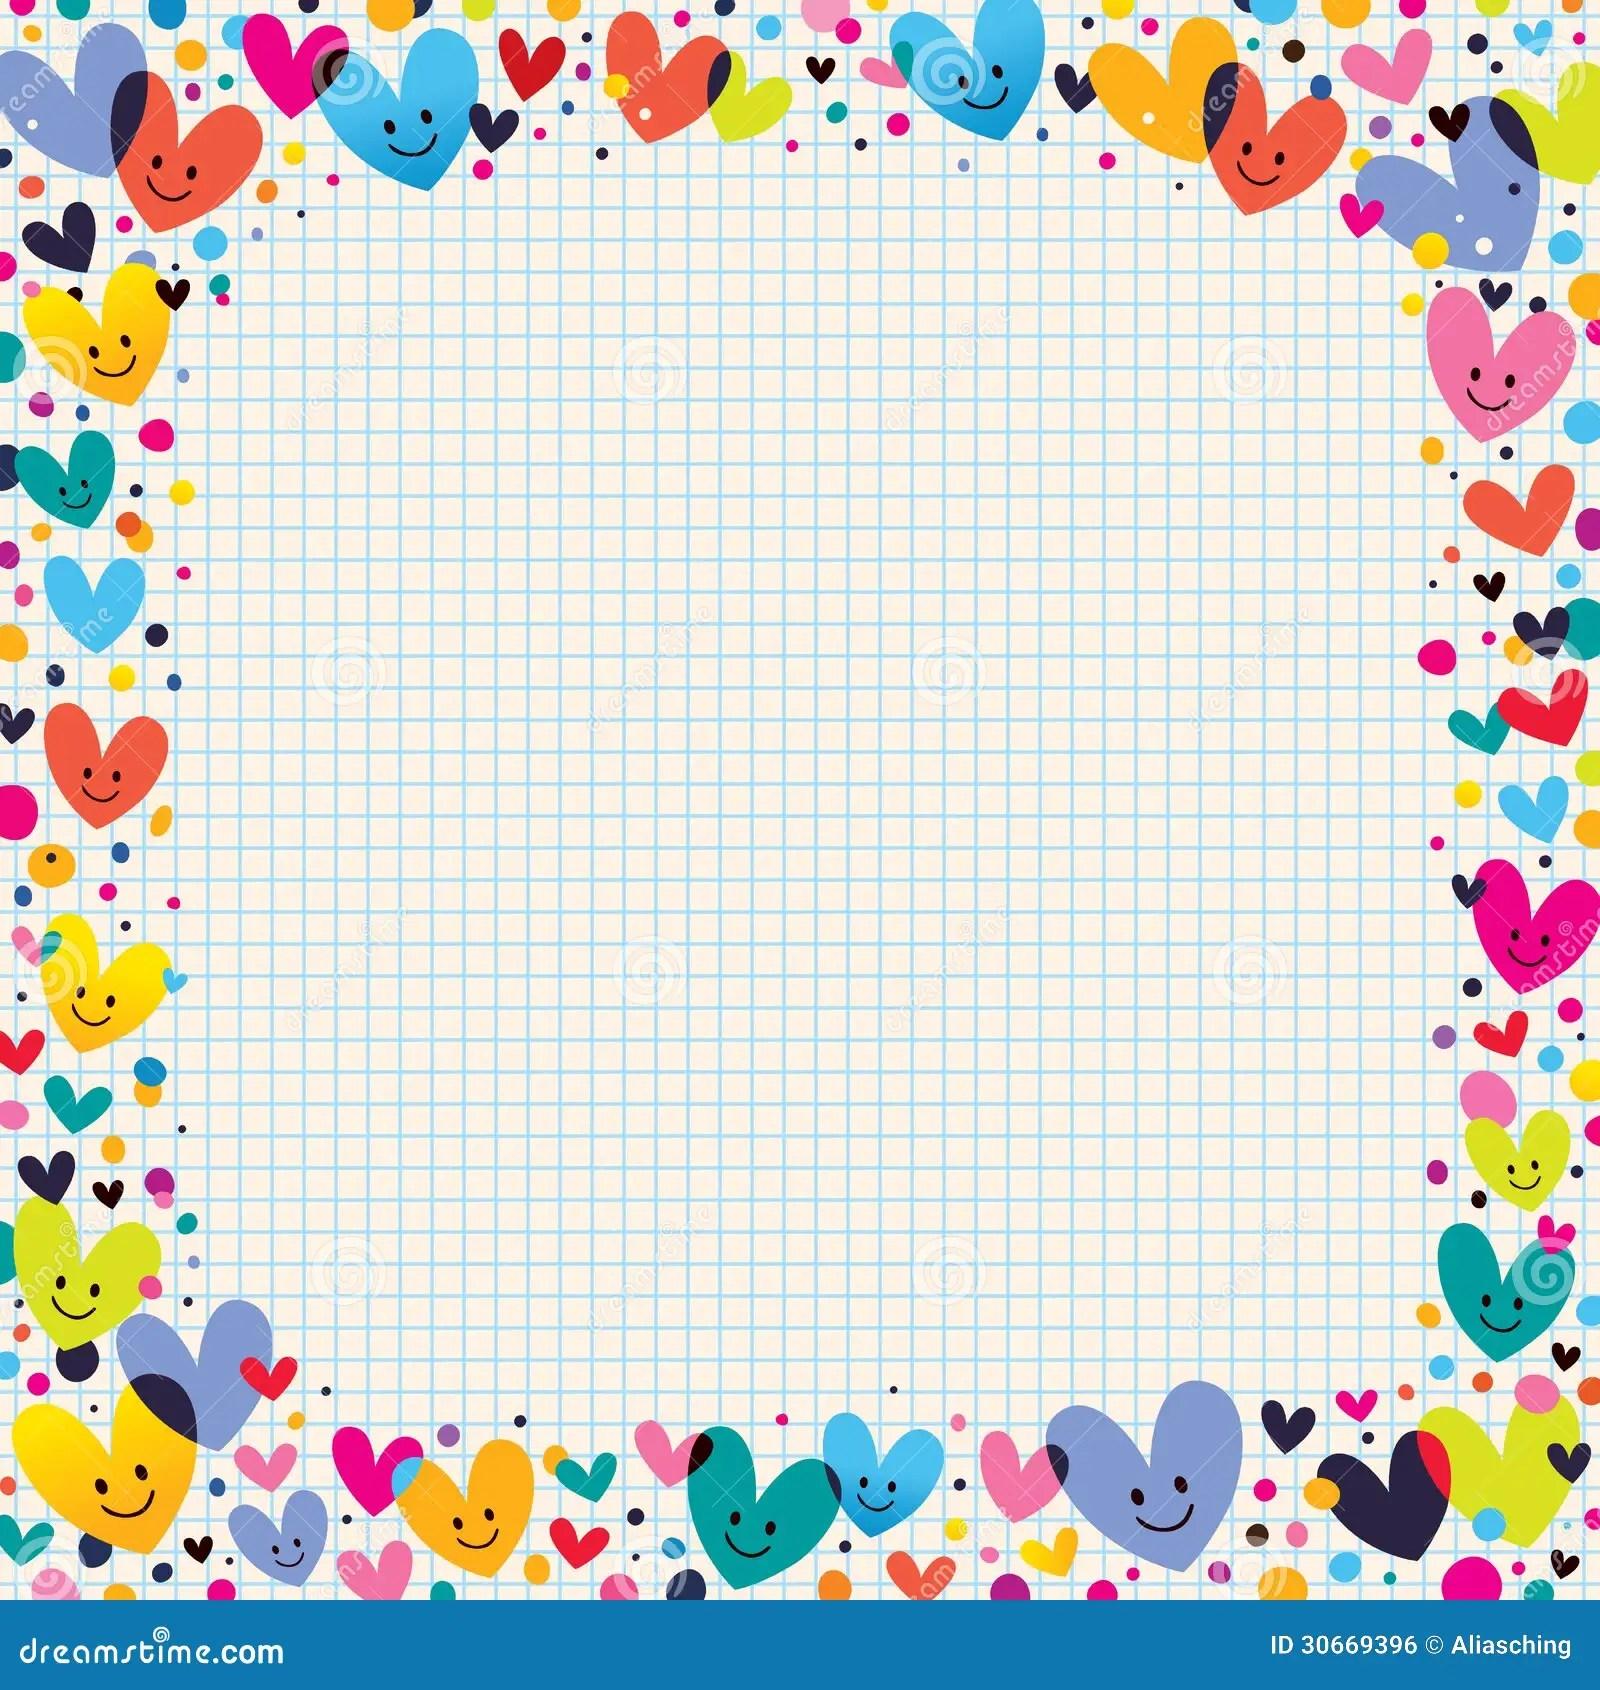 Cute Hearts Border Royalty Free Stock Image